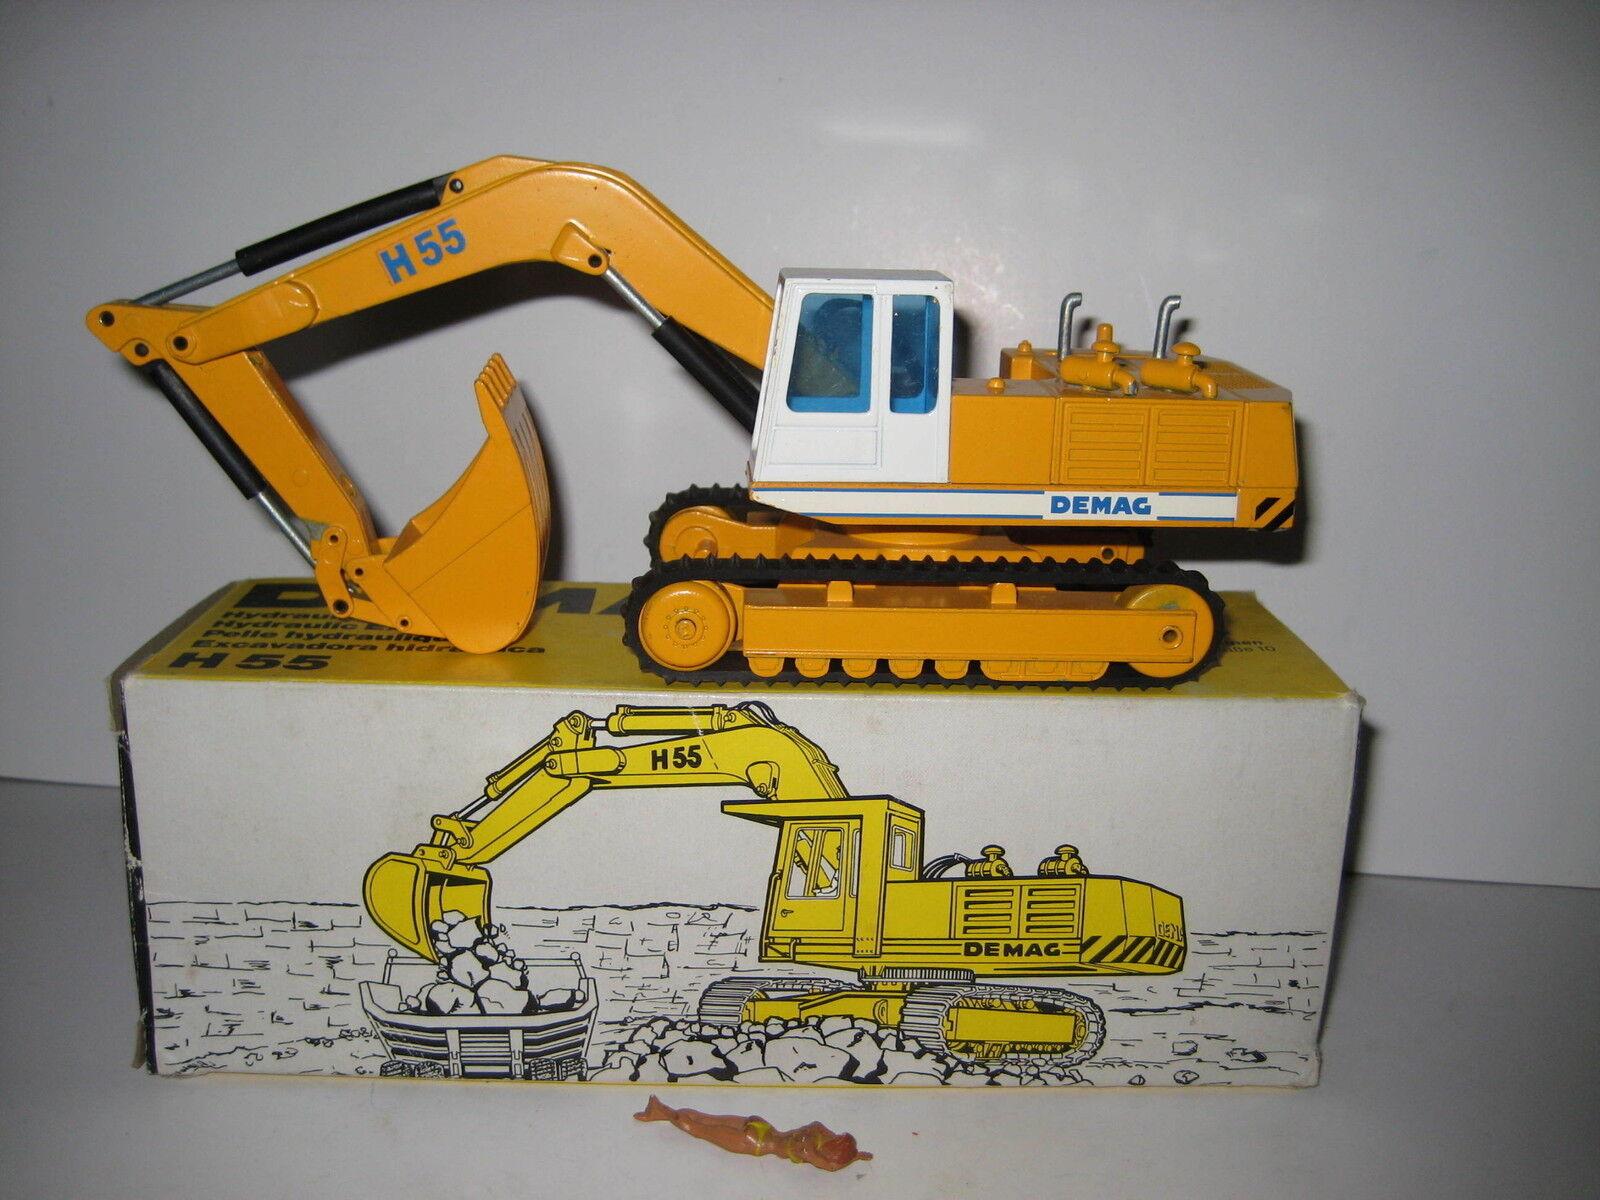 DEMAG H 55 Excavateurs tieflöffel vers à soie  273 NZG 1 50 neuf dans sa boîte